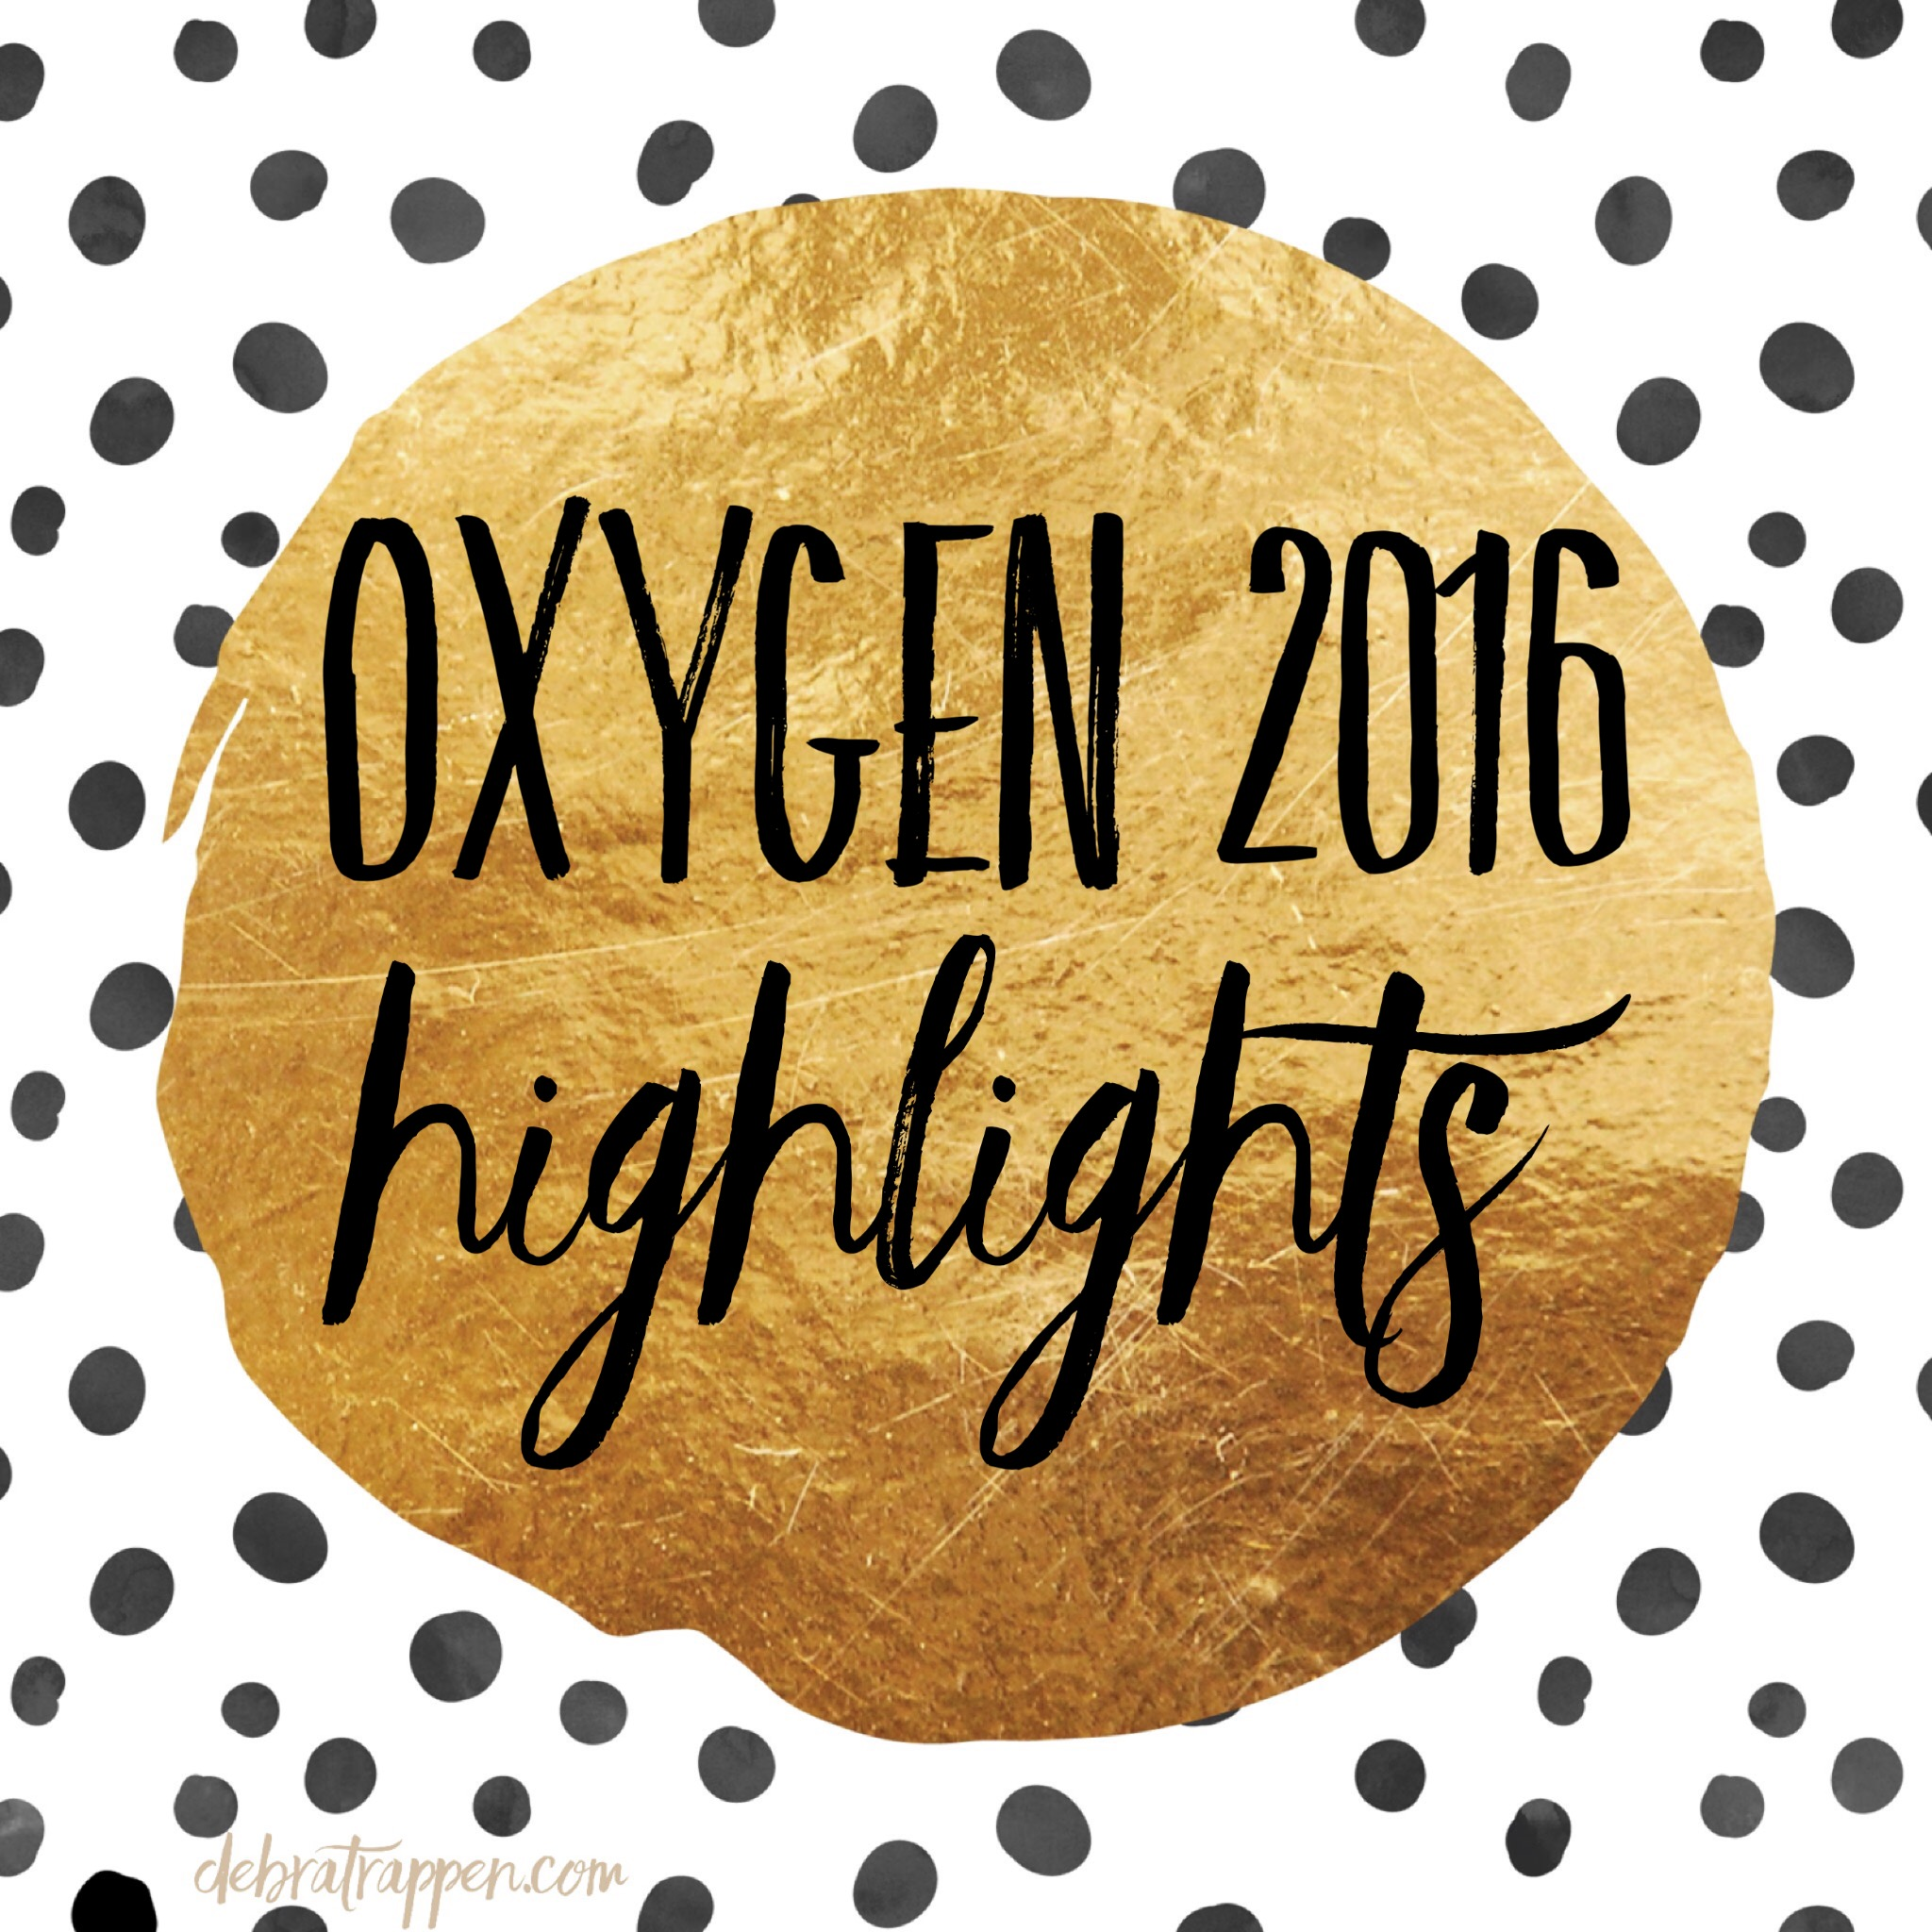 Oxygen 2016 Highlights